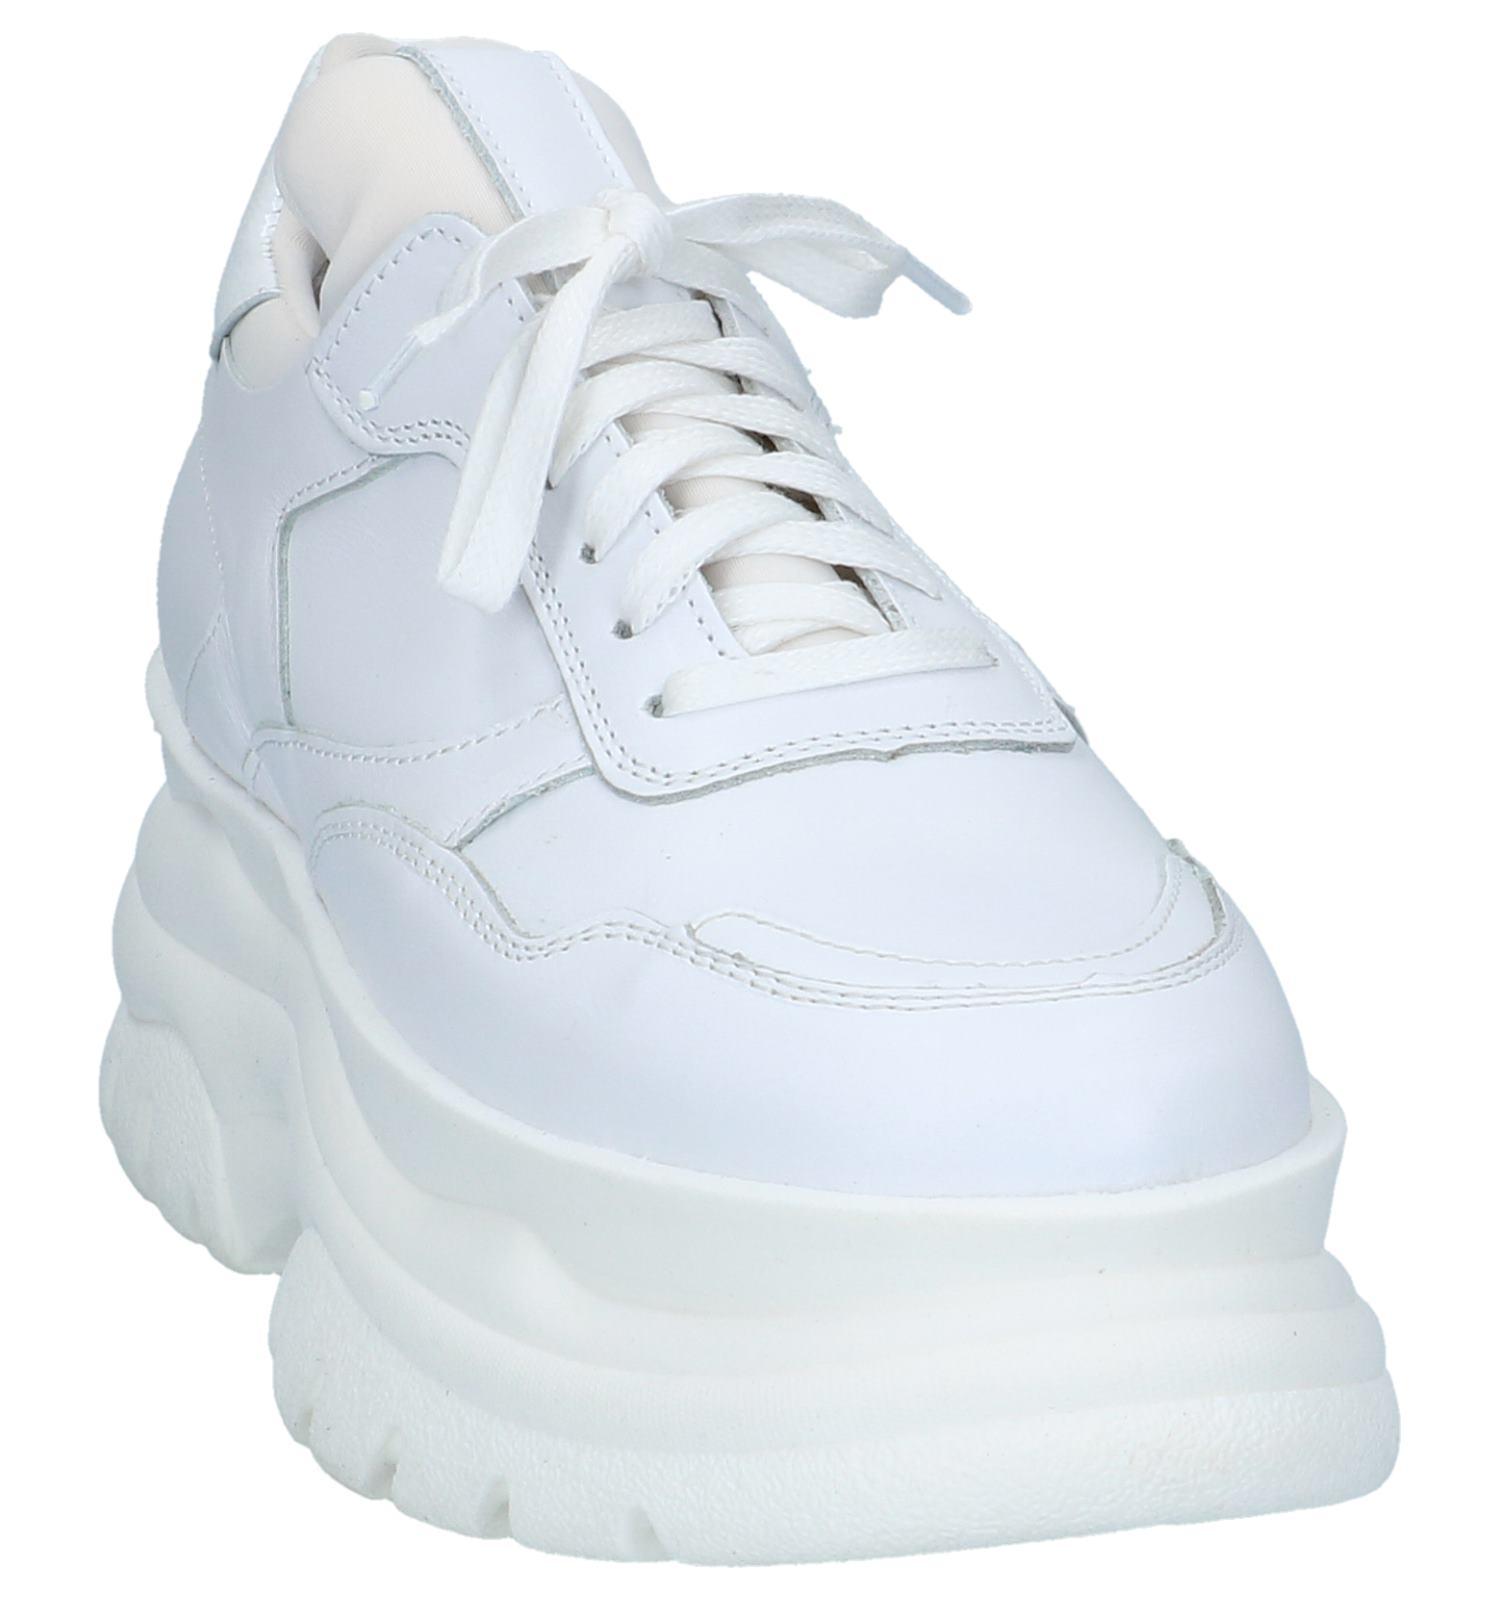 Lage Lage Witte Poelman Witte Poelman Poelman Sneakers Witte Geklede Geklede Sneakers oxErCBQdeW